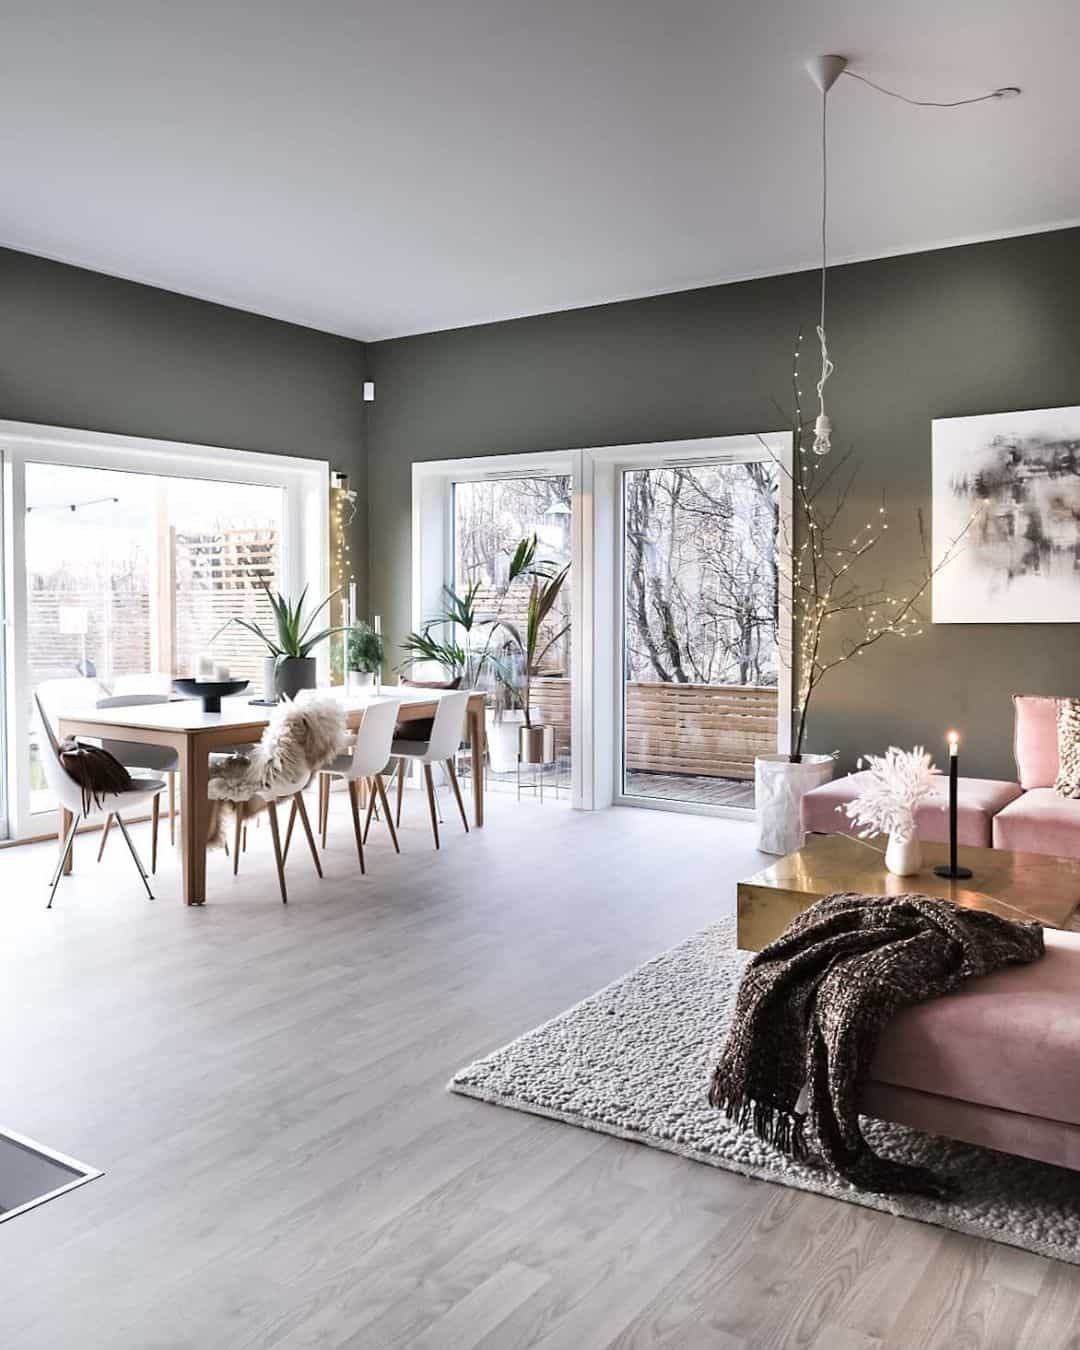 Modern Interior 2020: New And CreativeIinterior Design ...